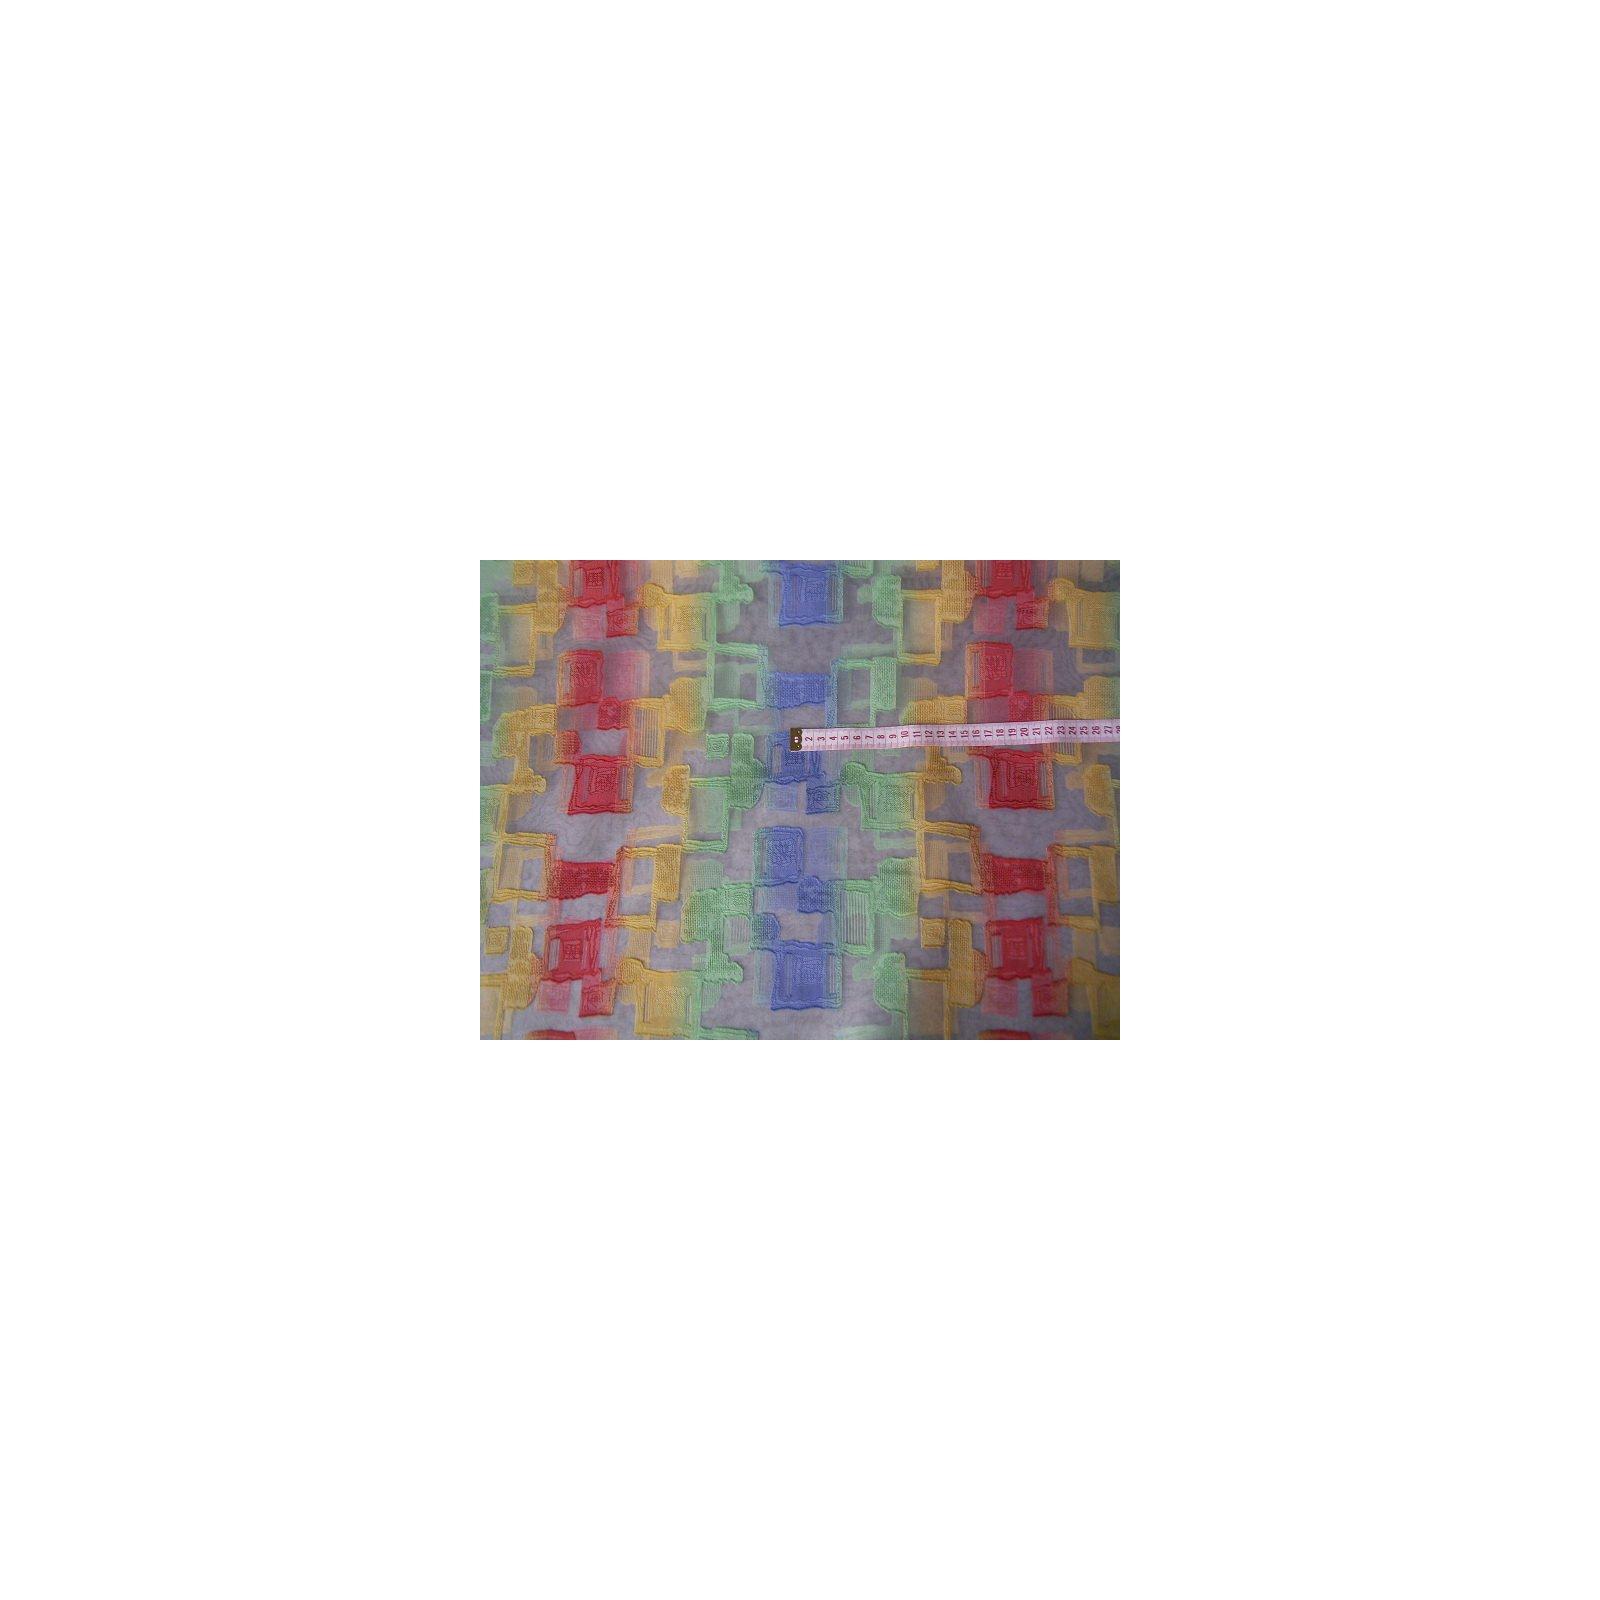 organzastoff rohwei mit gr n gelb rot und blau l ngs. Black Bedroom Furniture Sets. Home Design Ideas